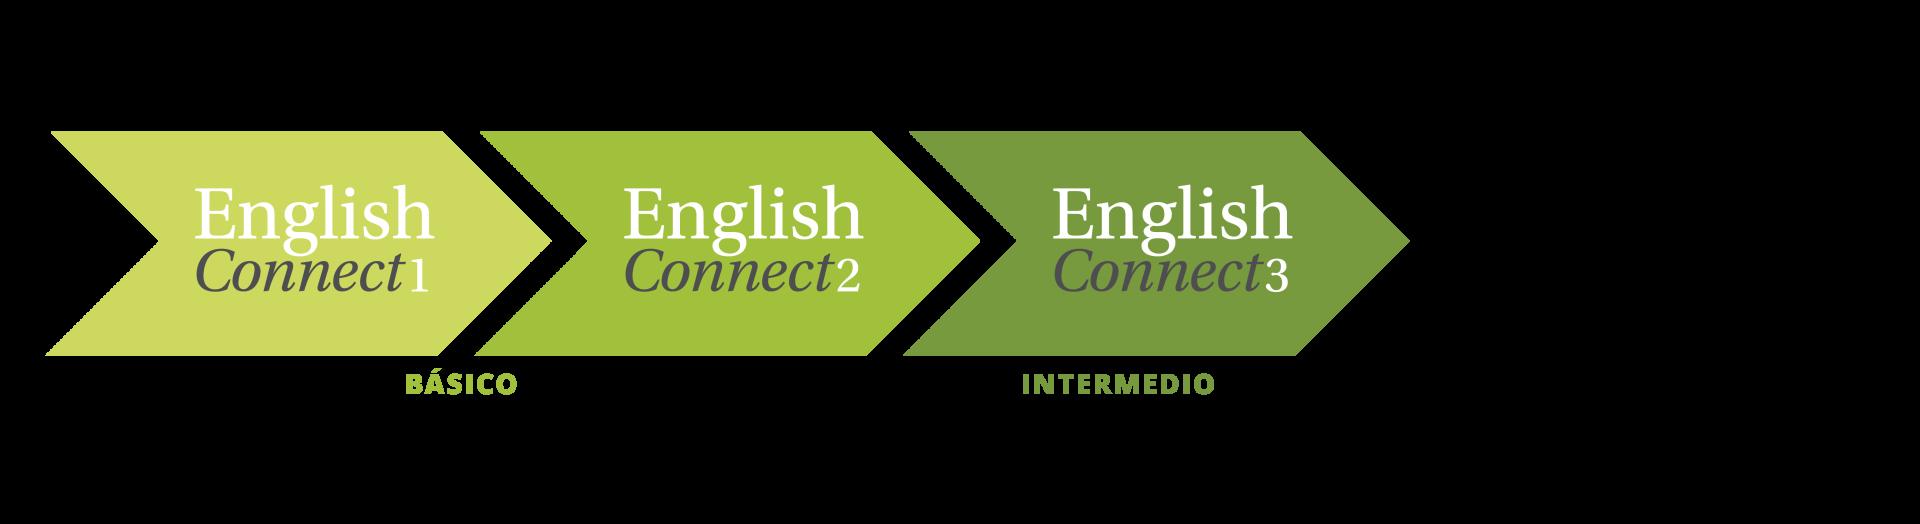 Icono de EnglishConnect